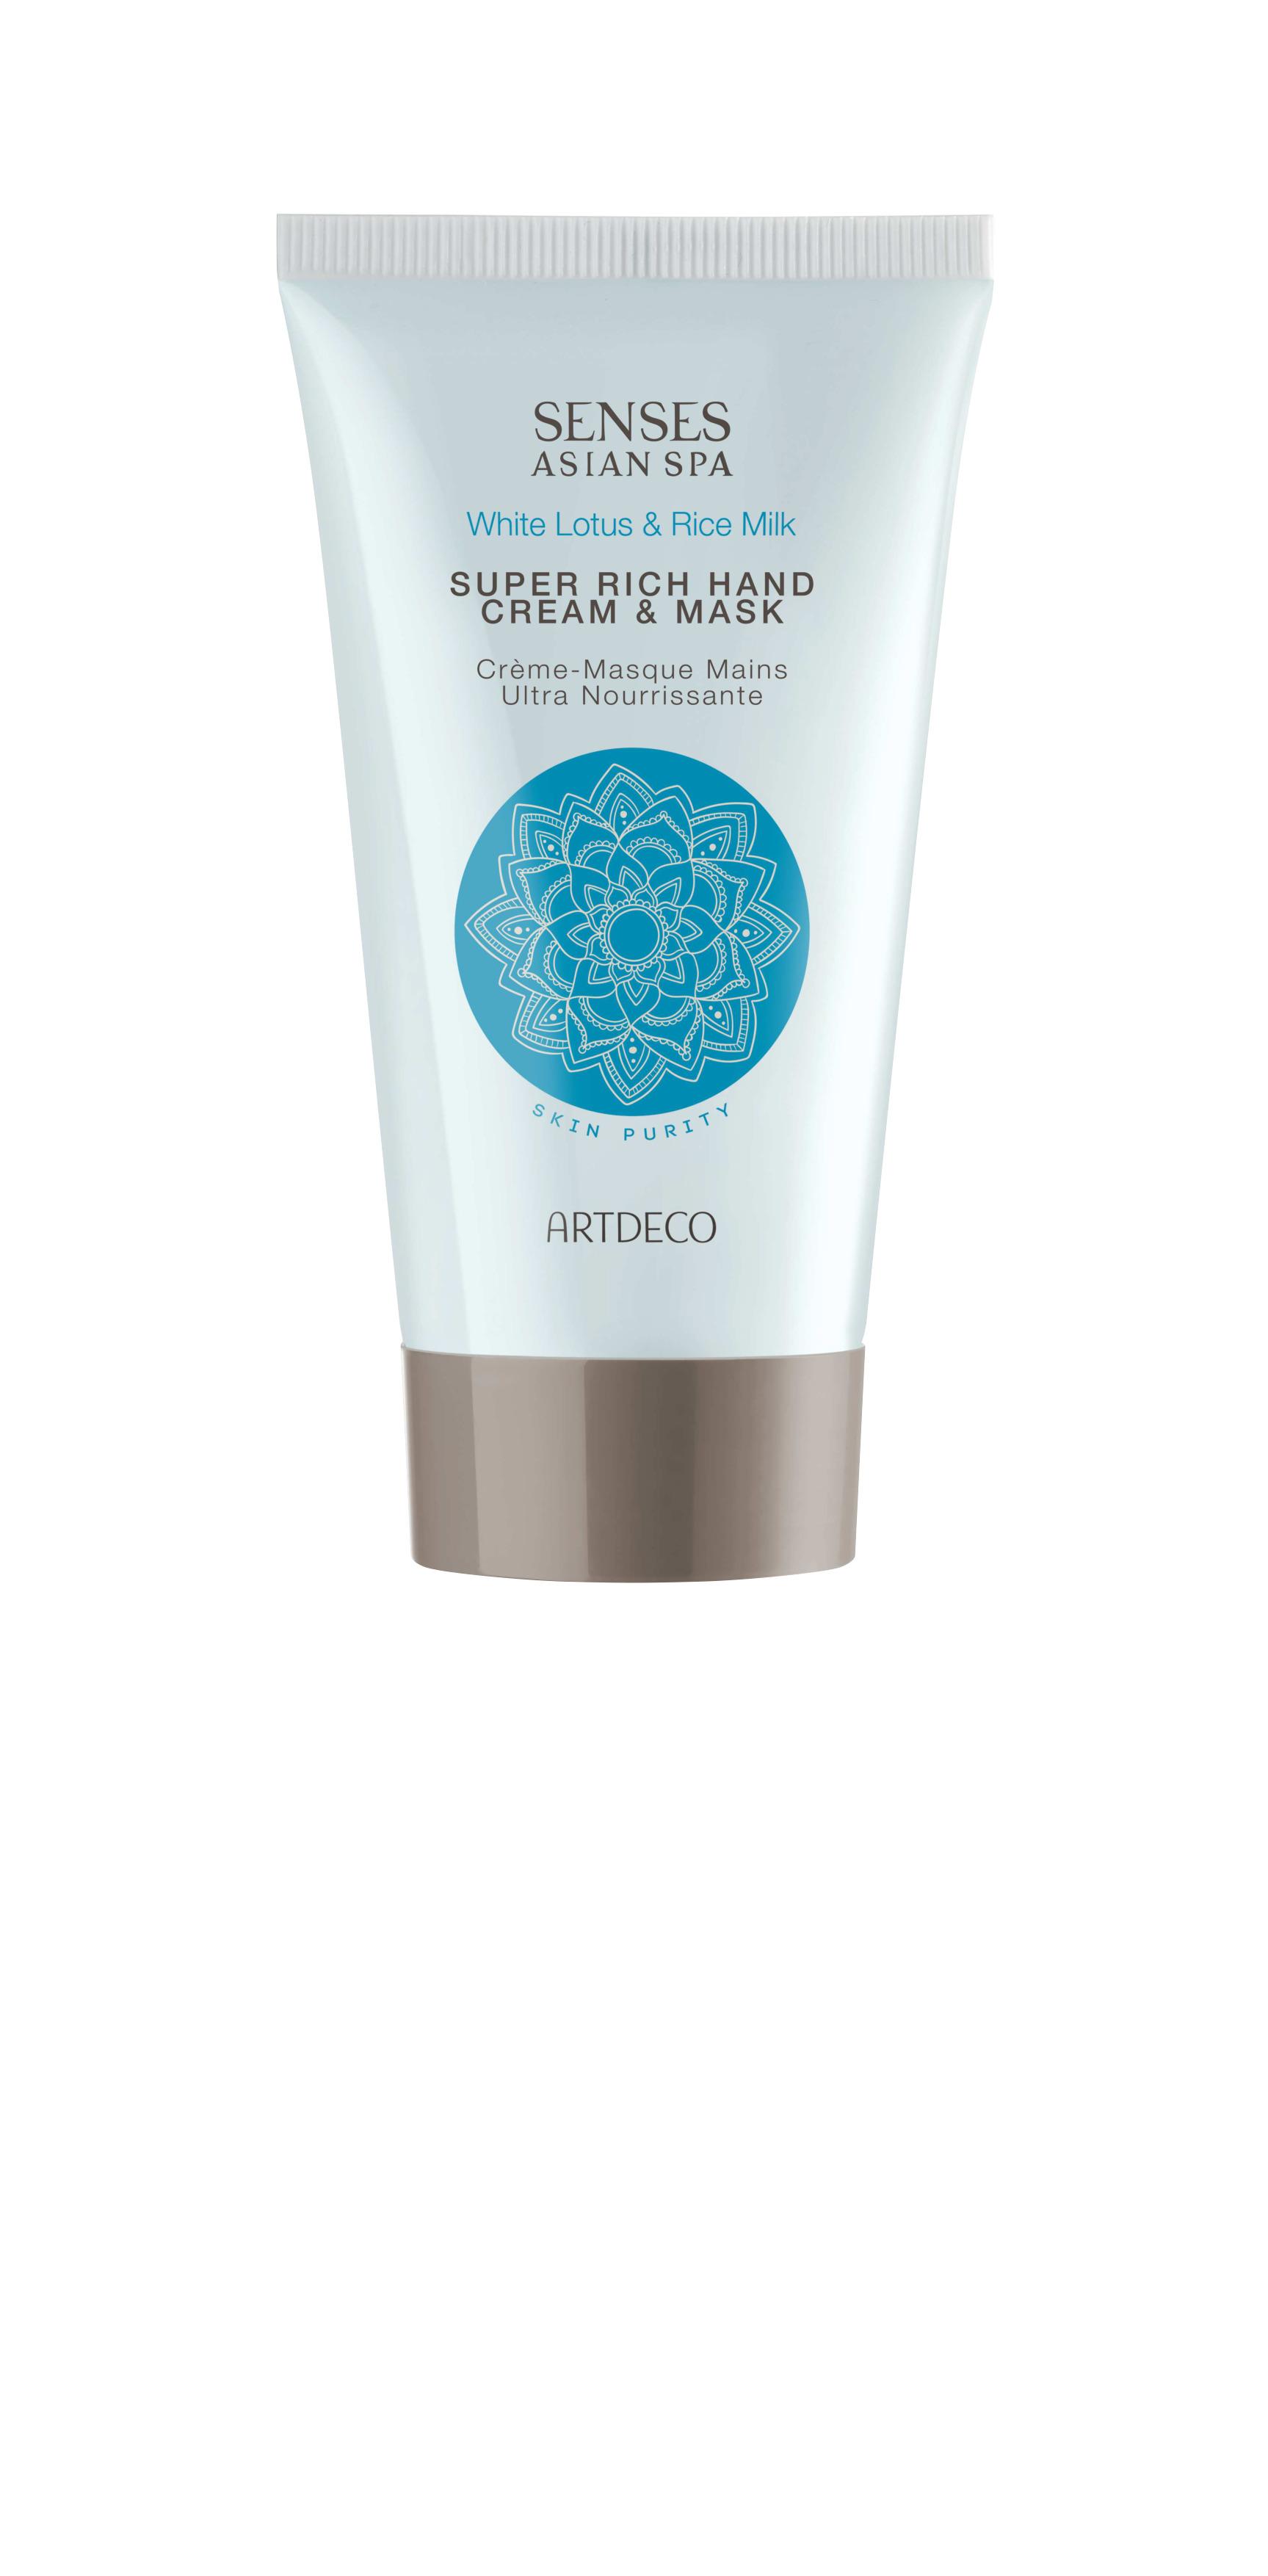 Artdeco крем-маска для рук питательный Super rich hand cream  mask, skin purity, 75 мл